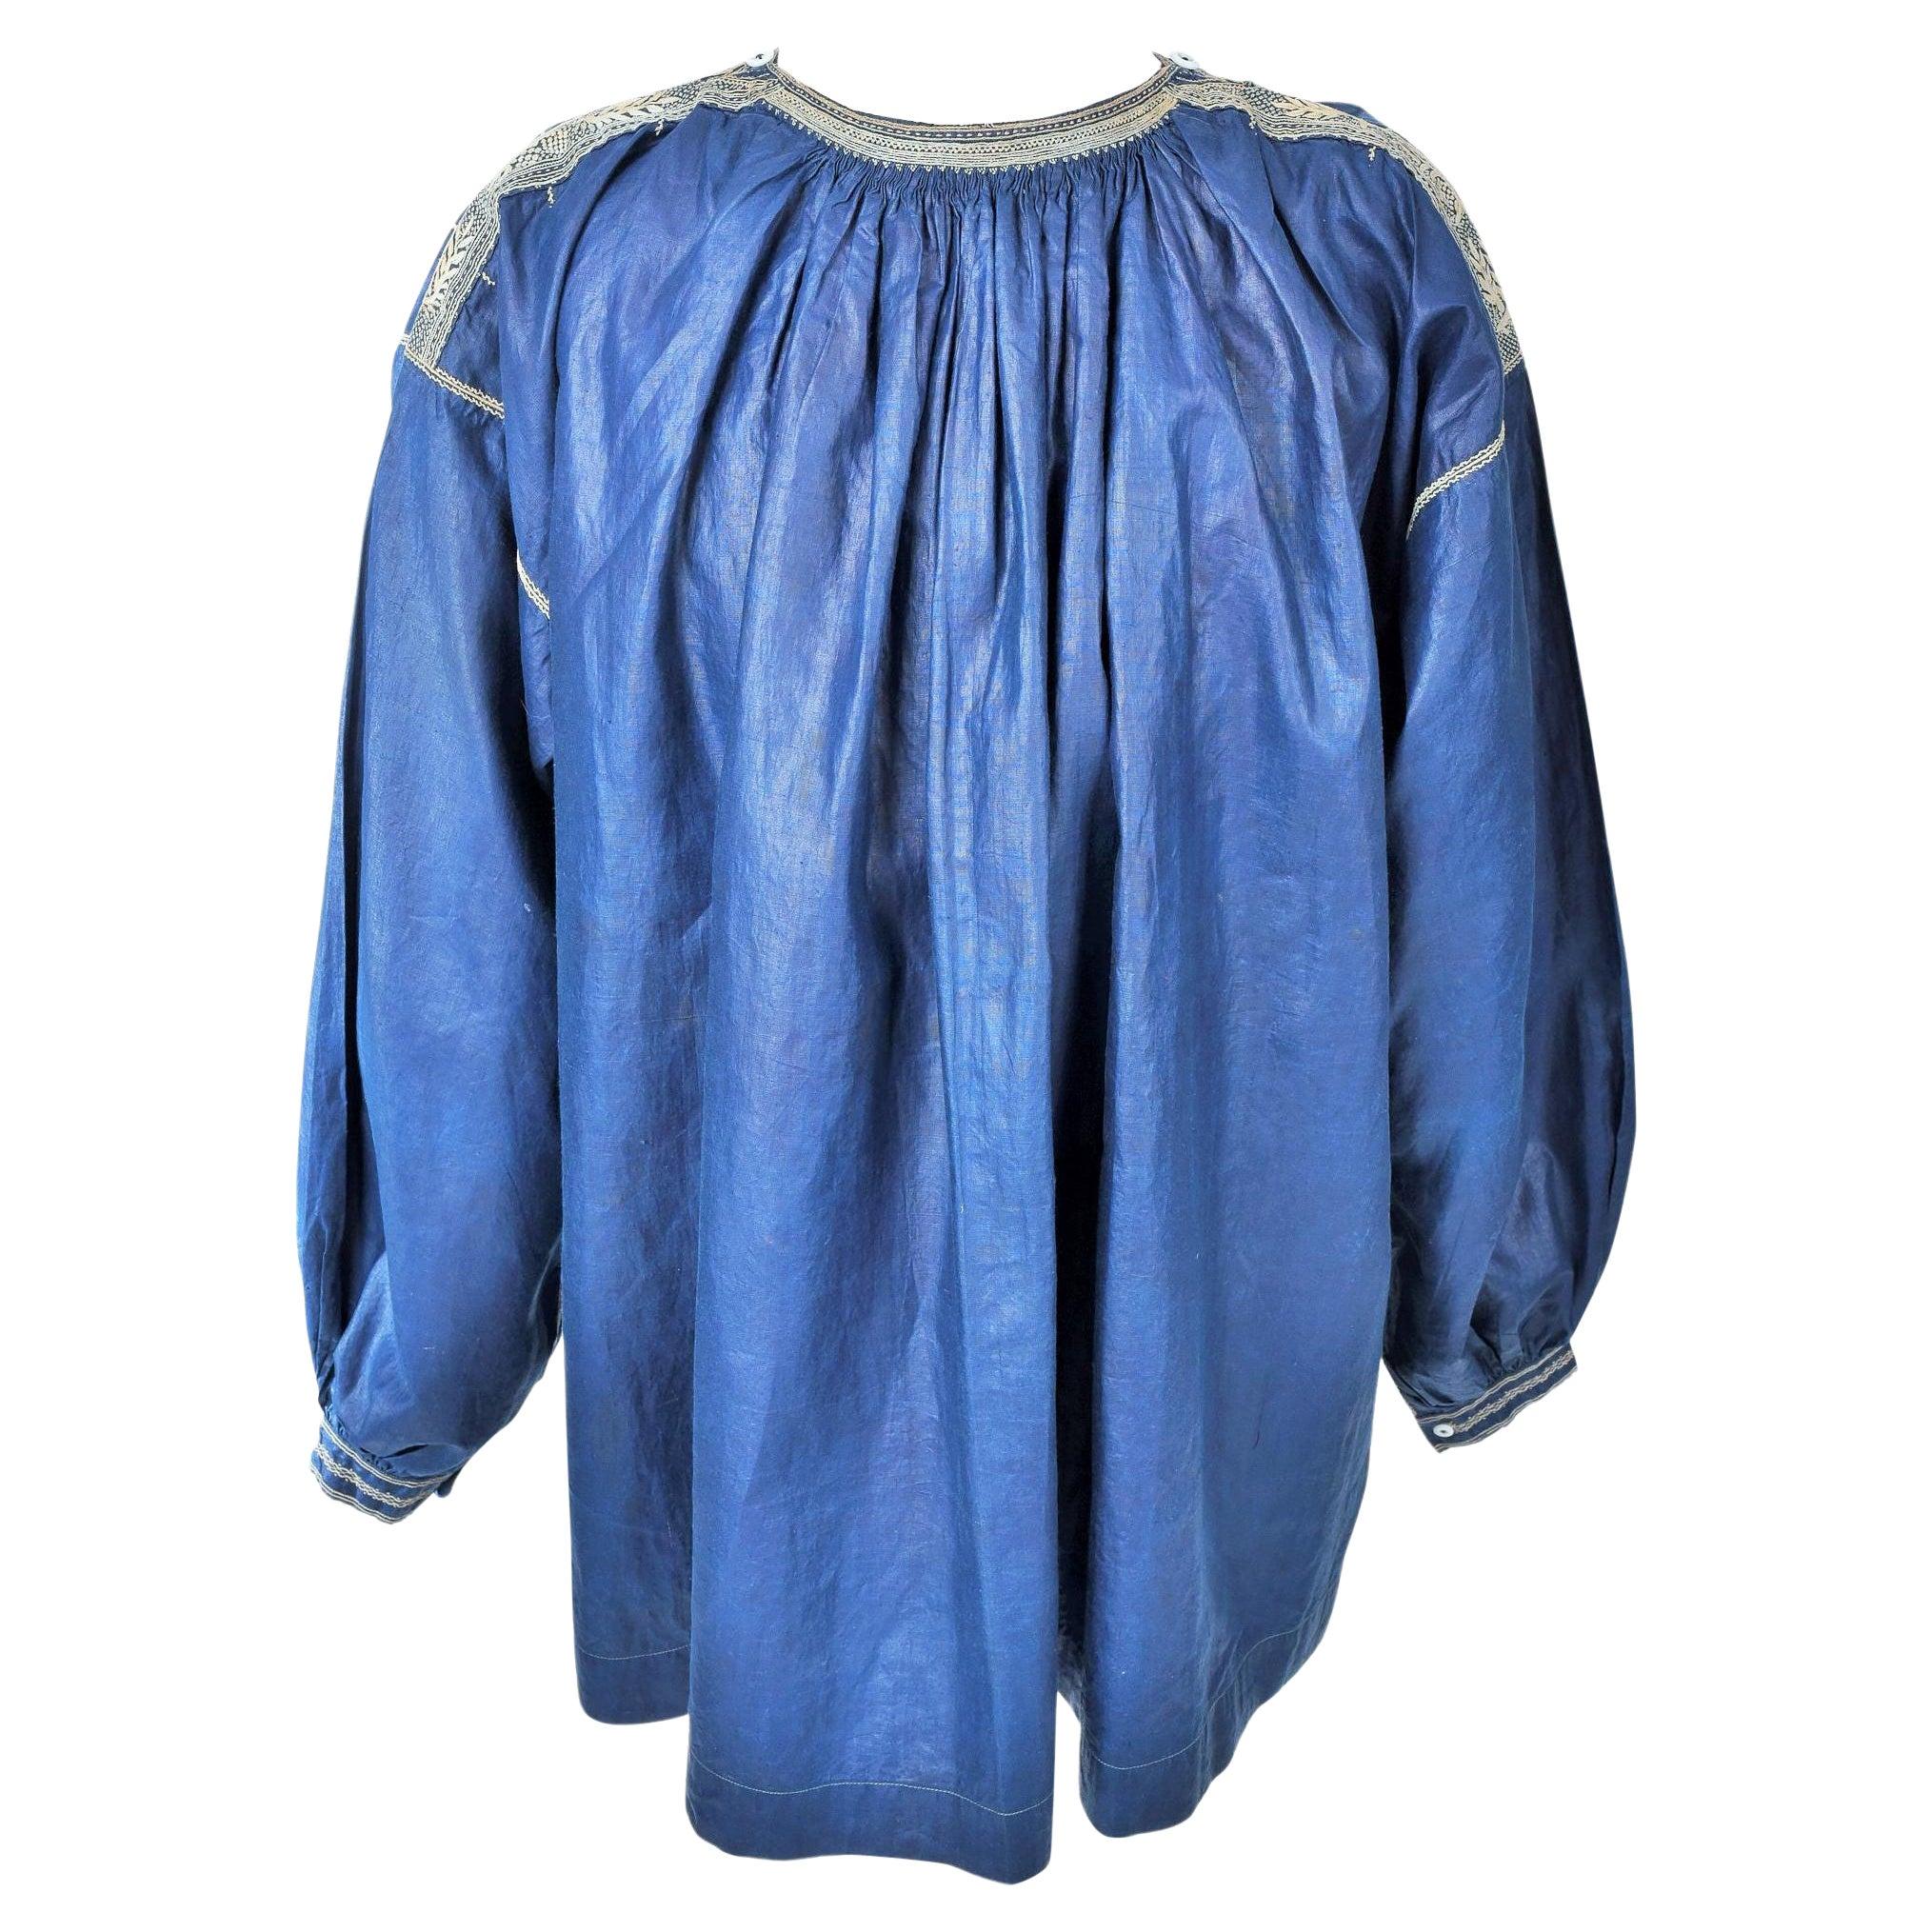 Mid-19th Century Clothing